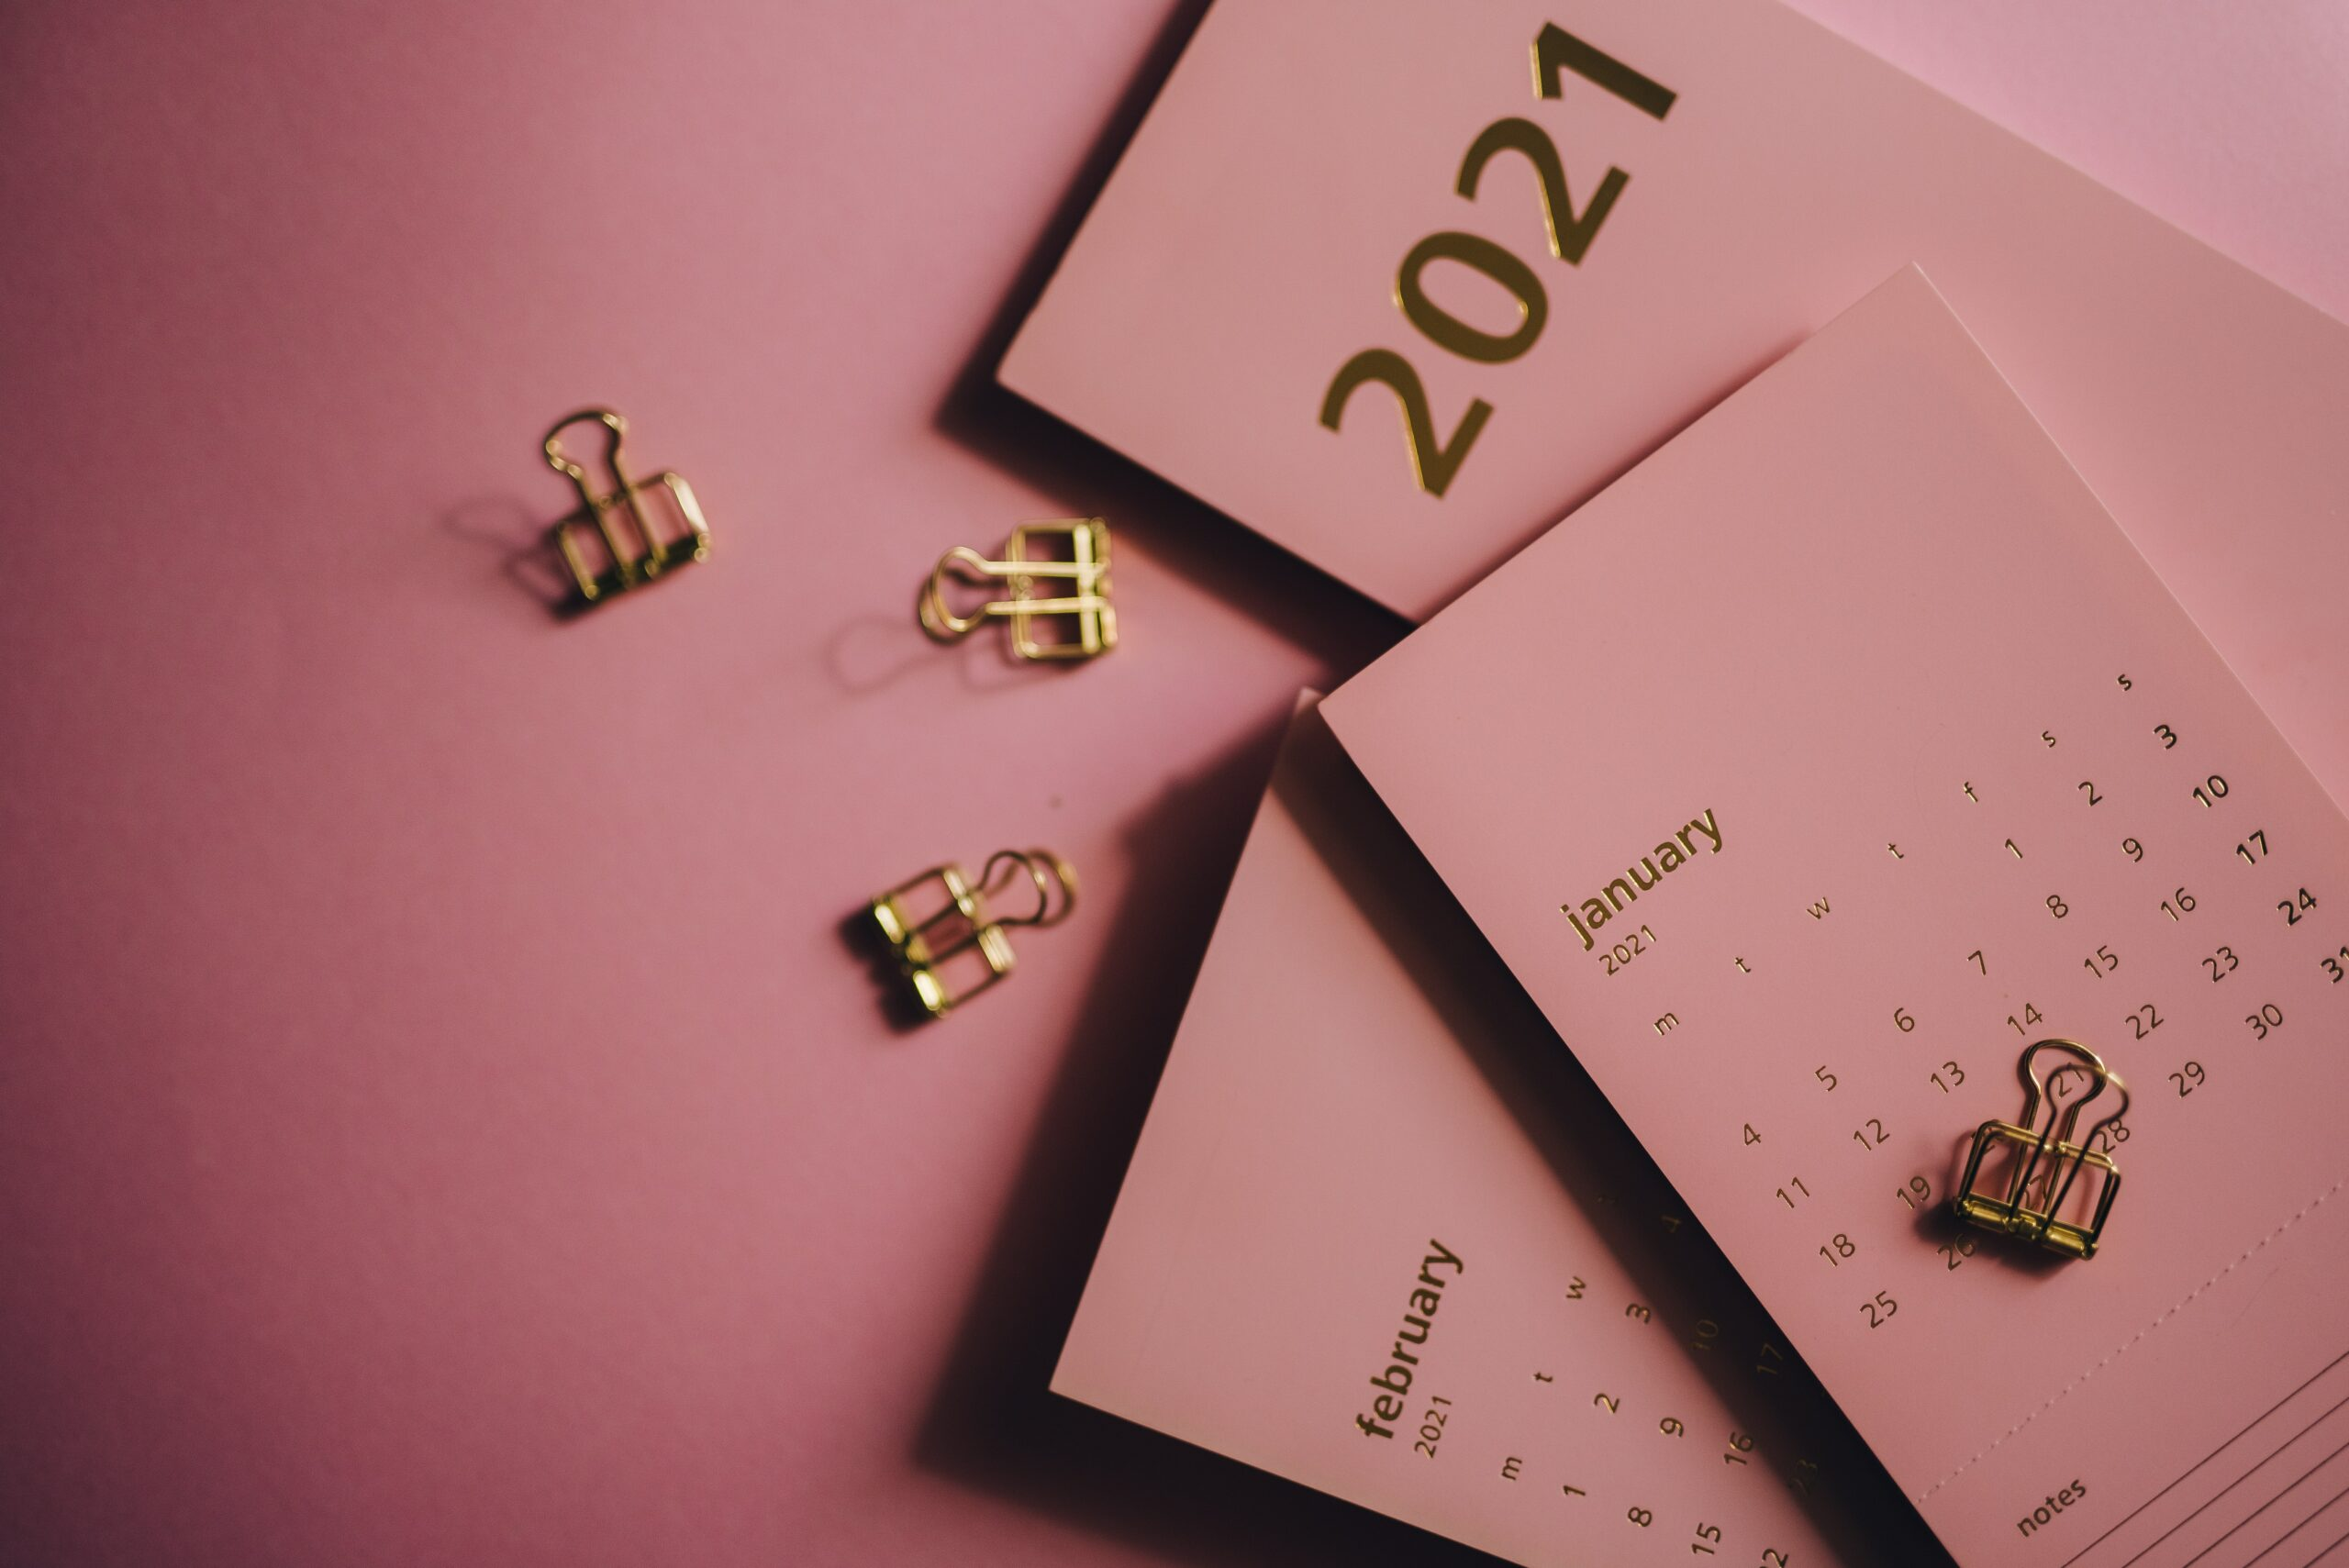 hautpsychologie modetrend abo kalender